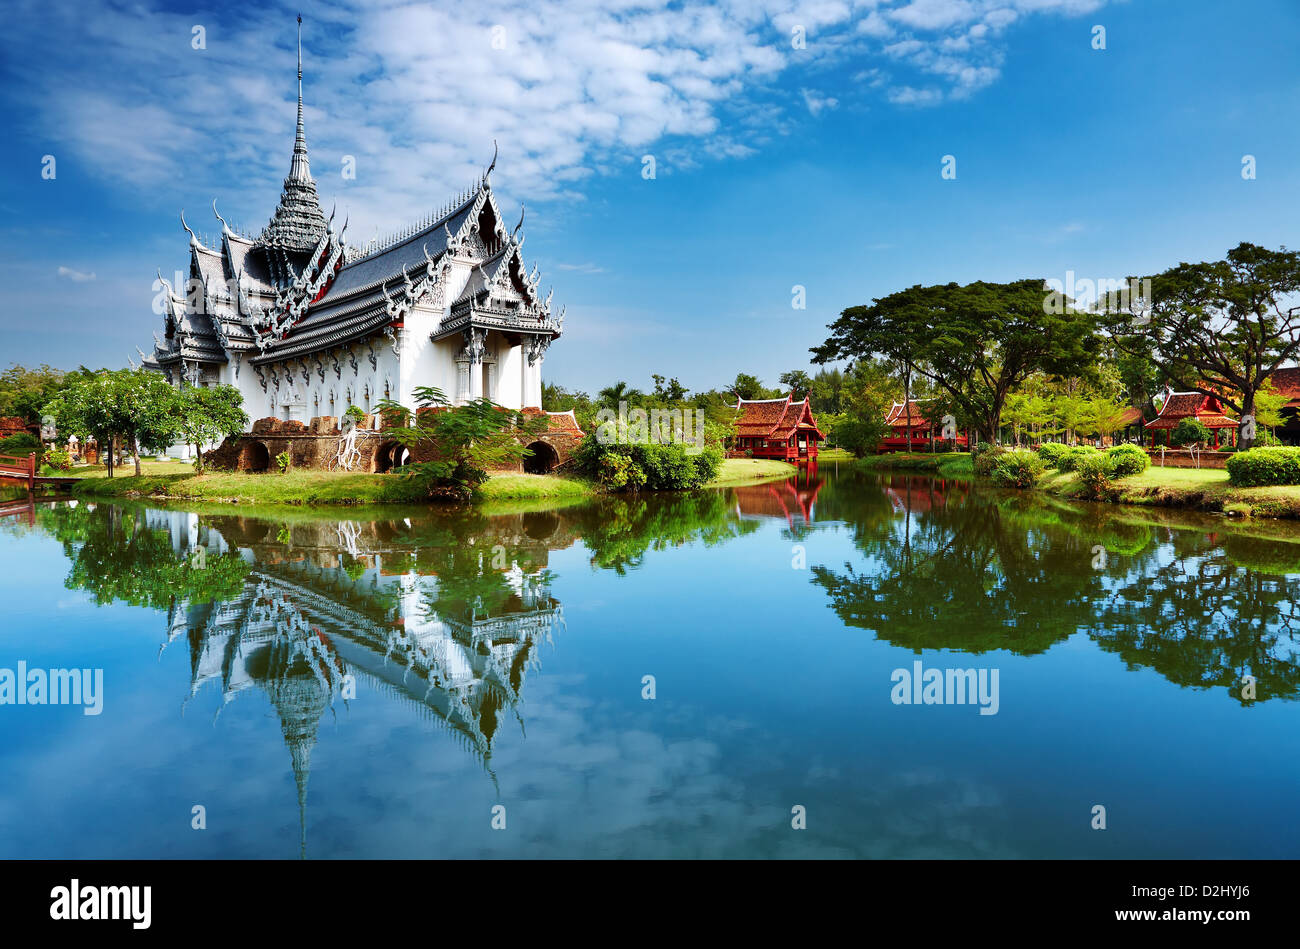 Sanphet Prasat Palace, Ancient City, Bangkok, Thailand - Stock Image